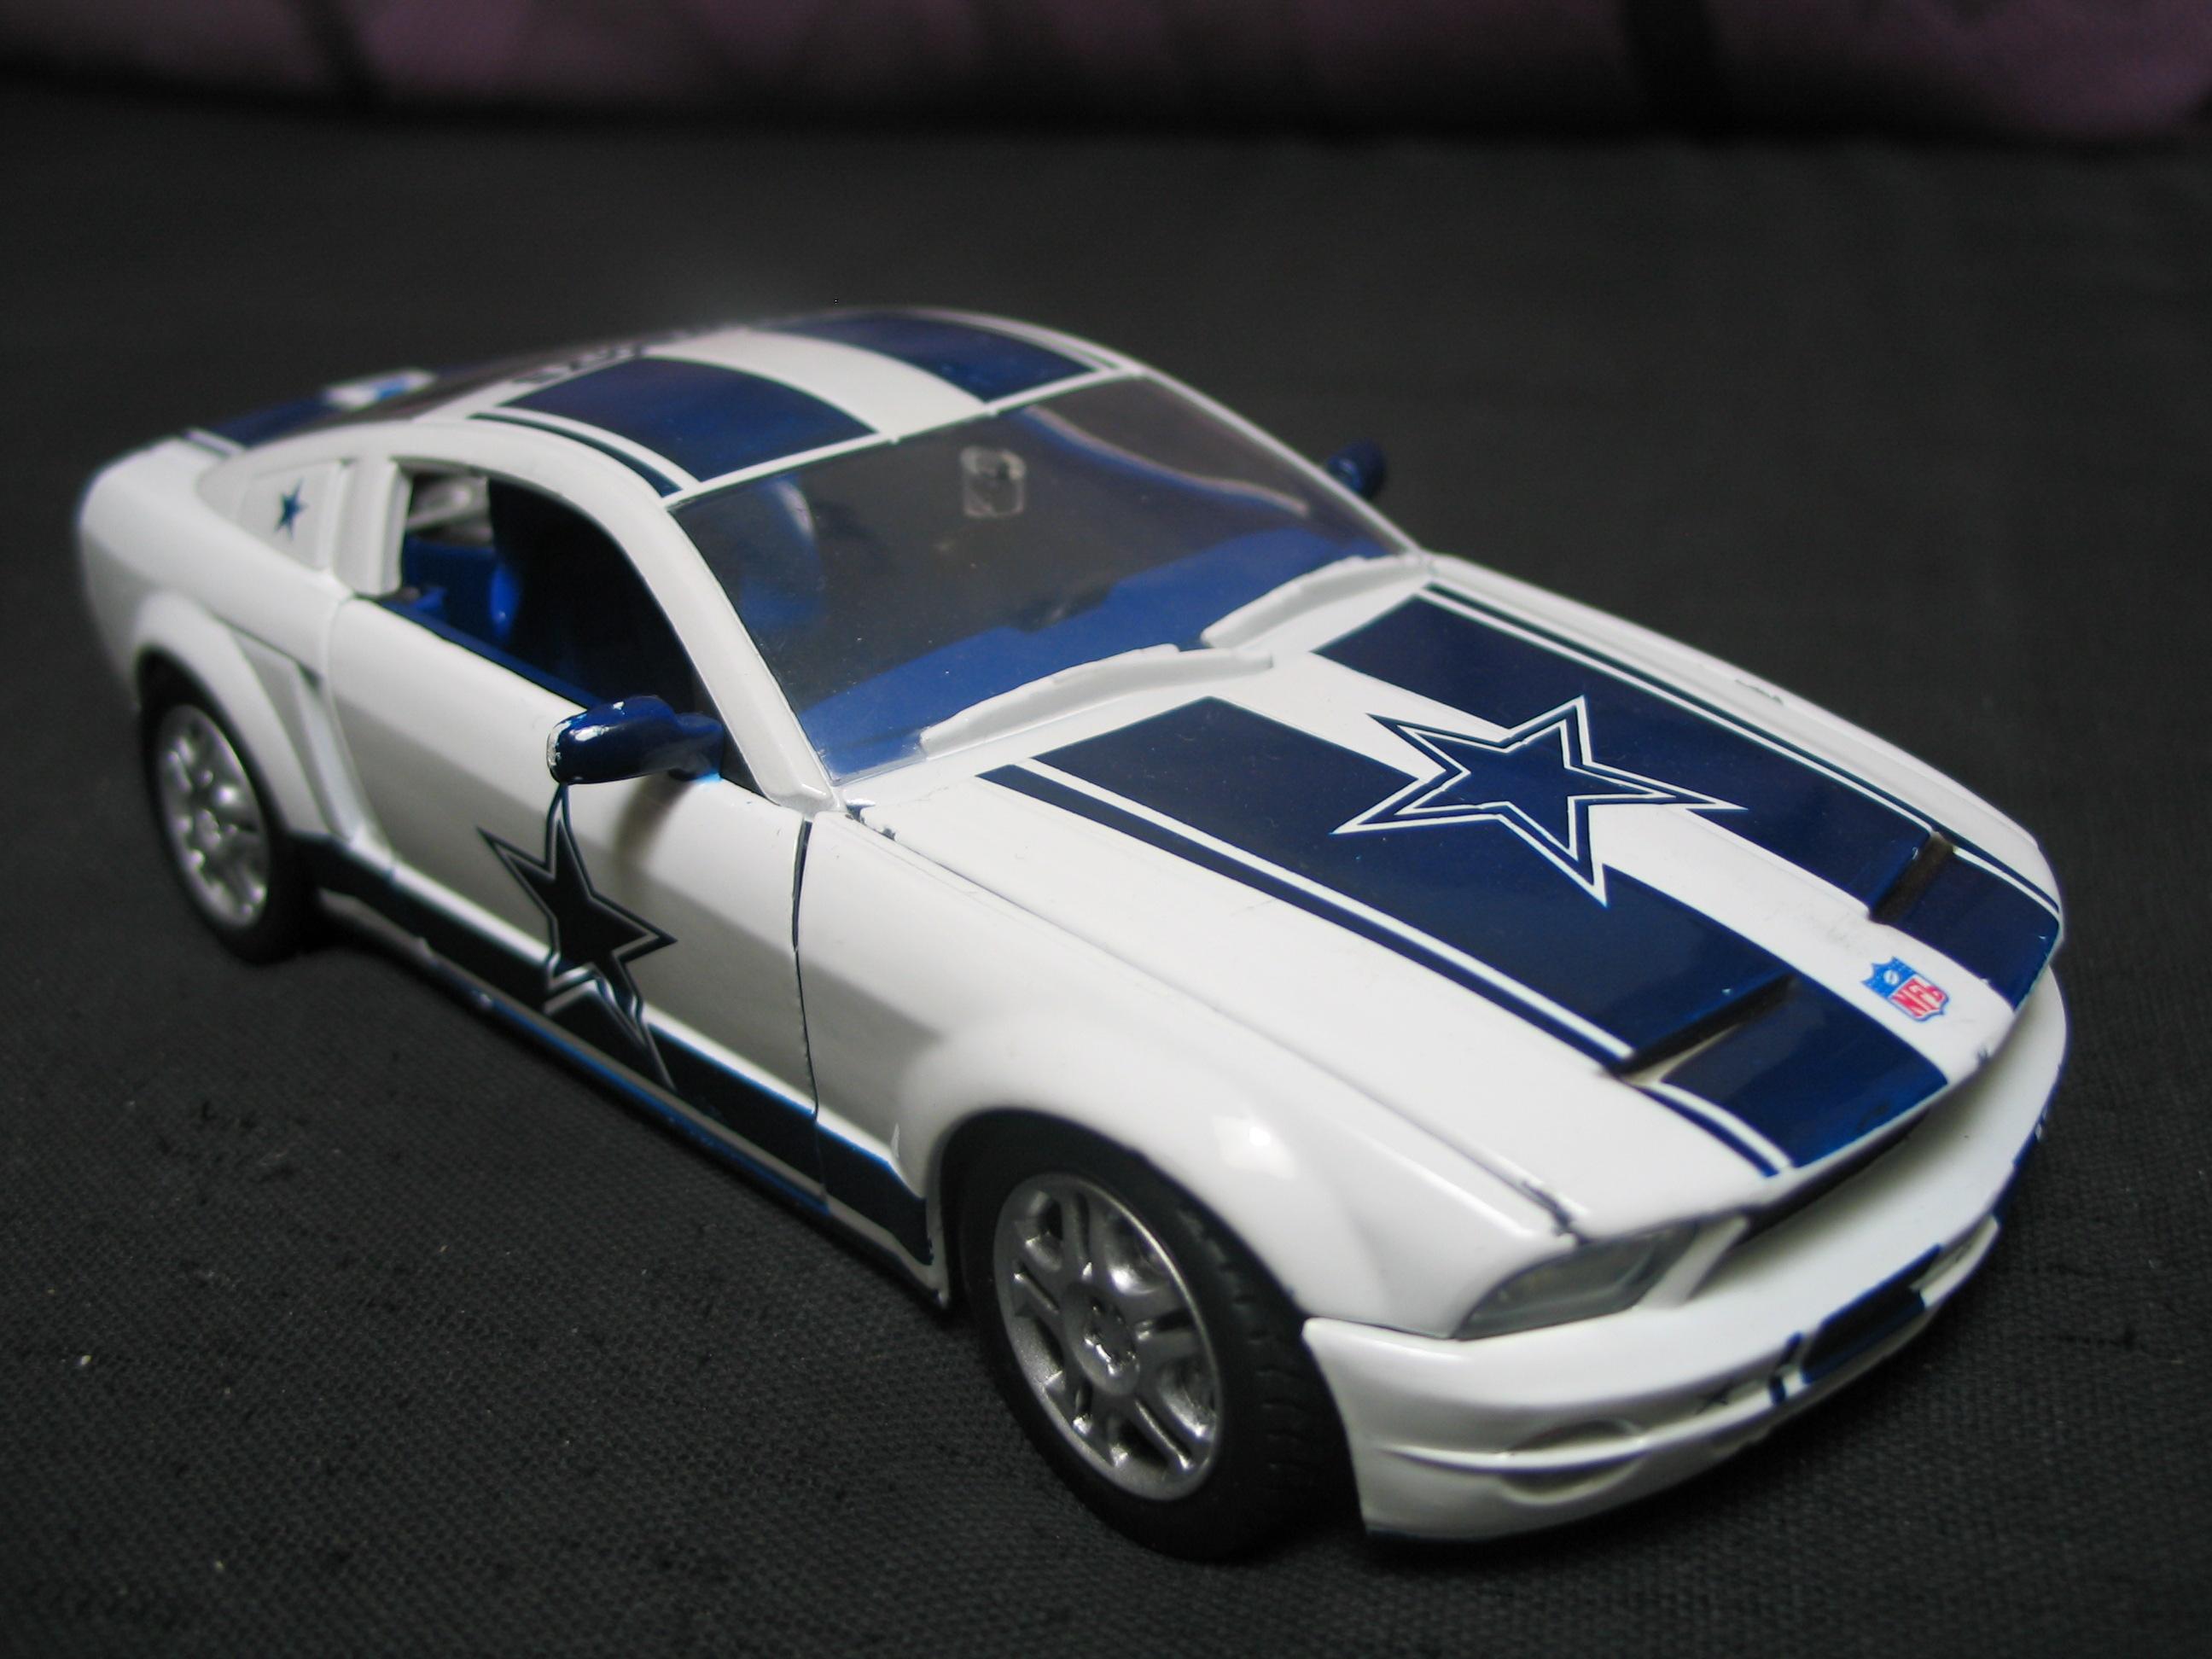 car - Dallas Cowboys Photo (33707694) - Fanpop - Page 3